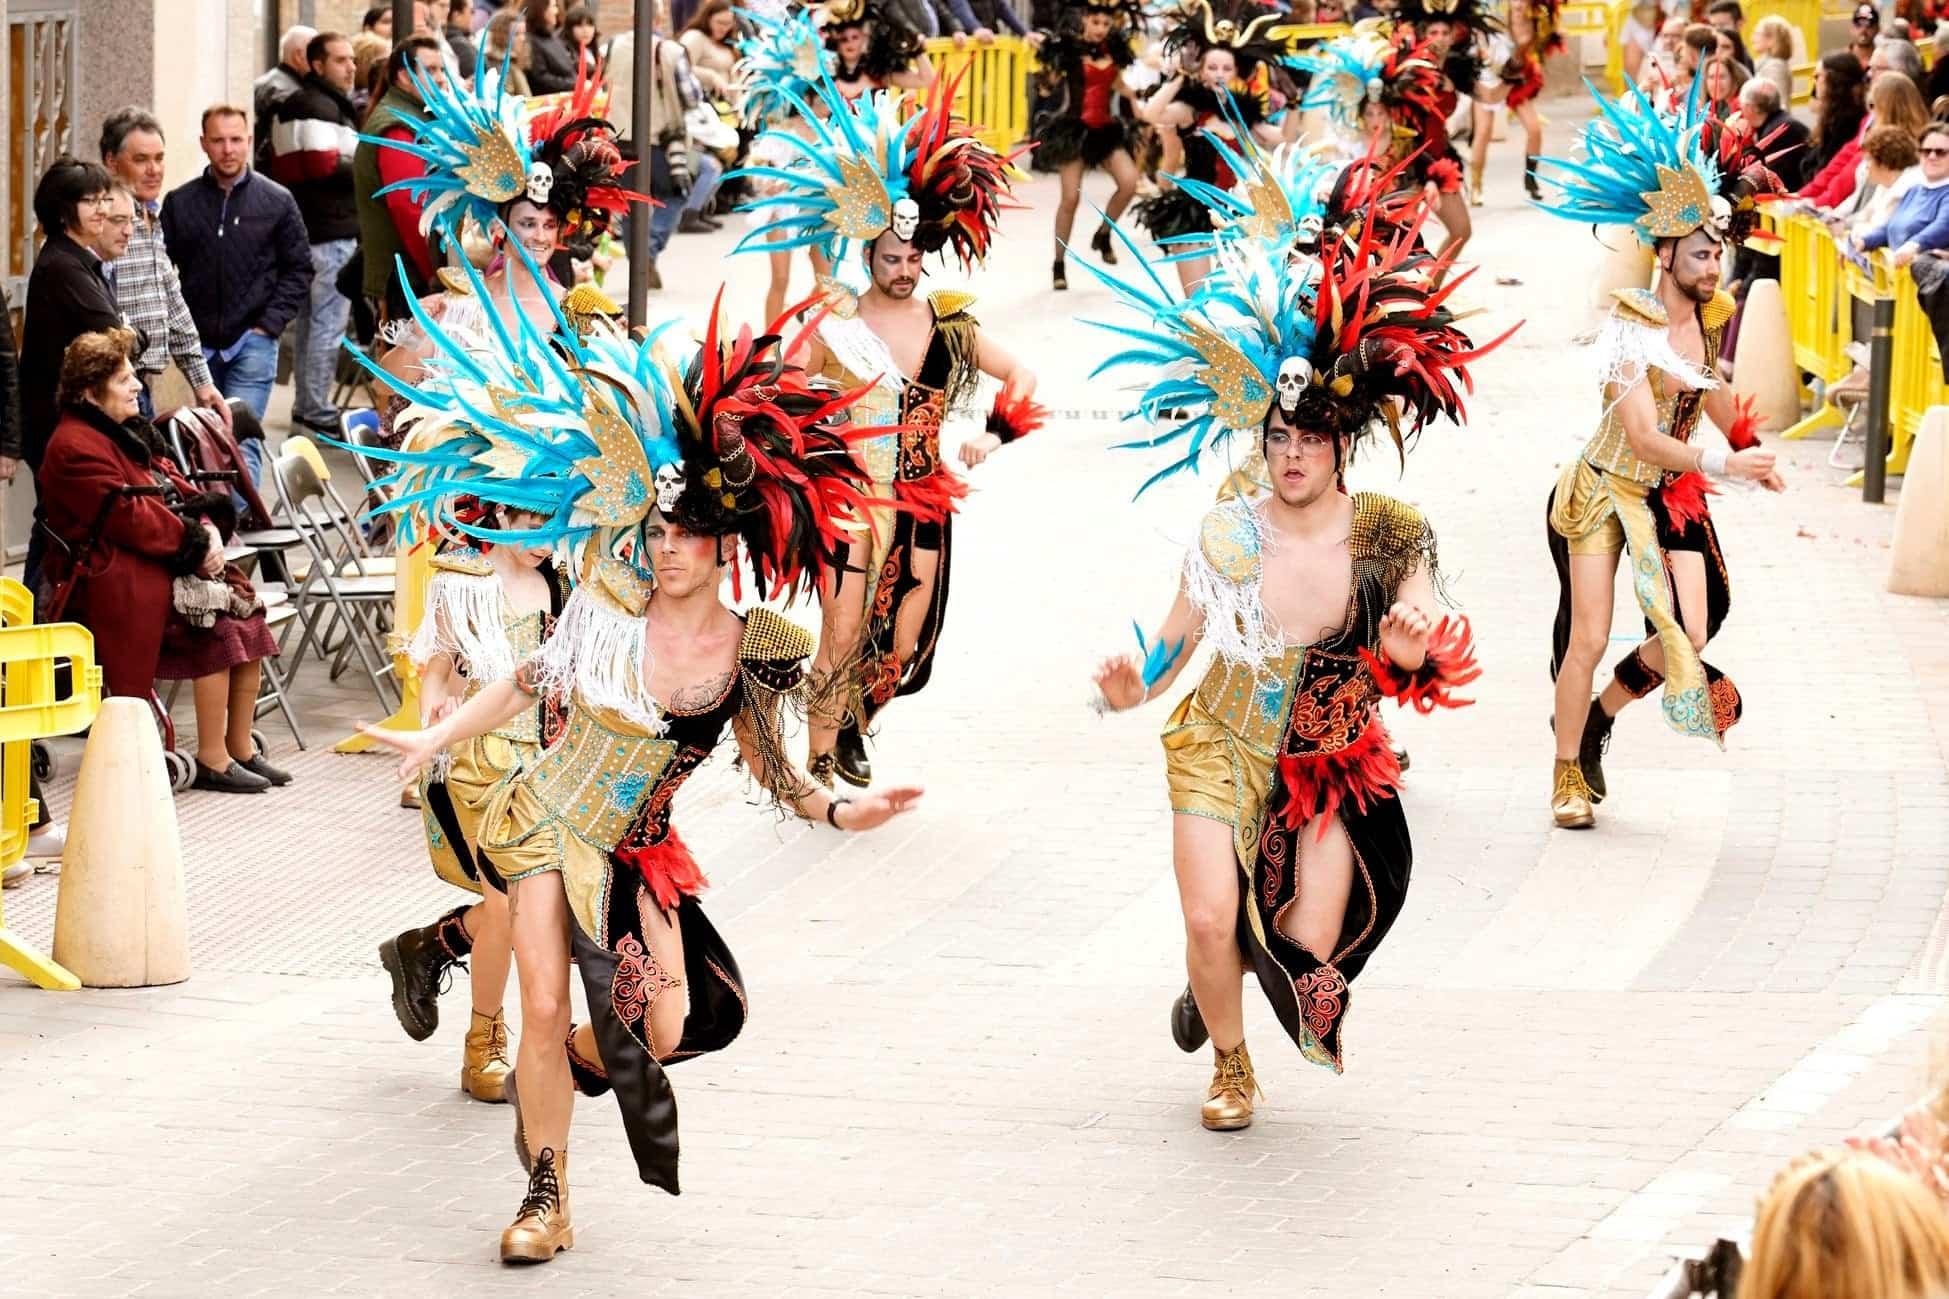 Carnaval de herencia 2020 ofertorio 87 - Selección de fotografías del Ofertorio del Carnaval de Herencia